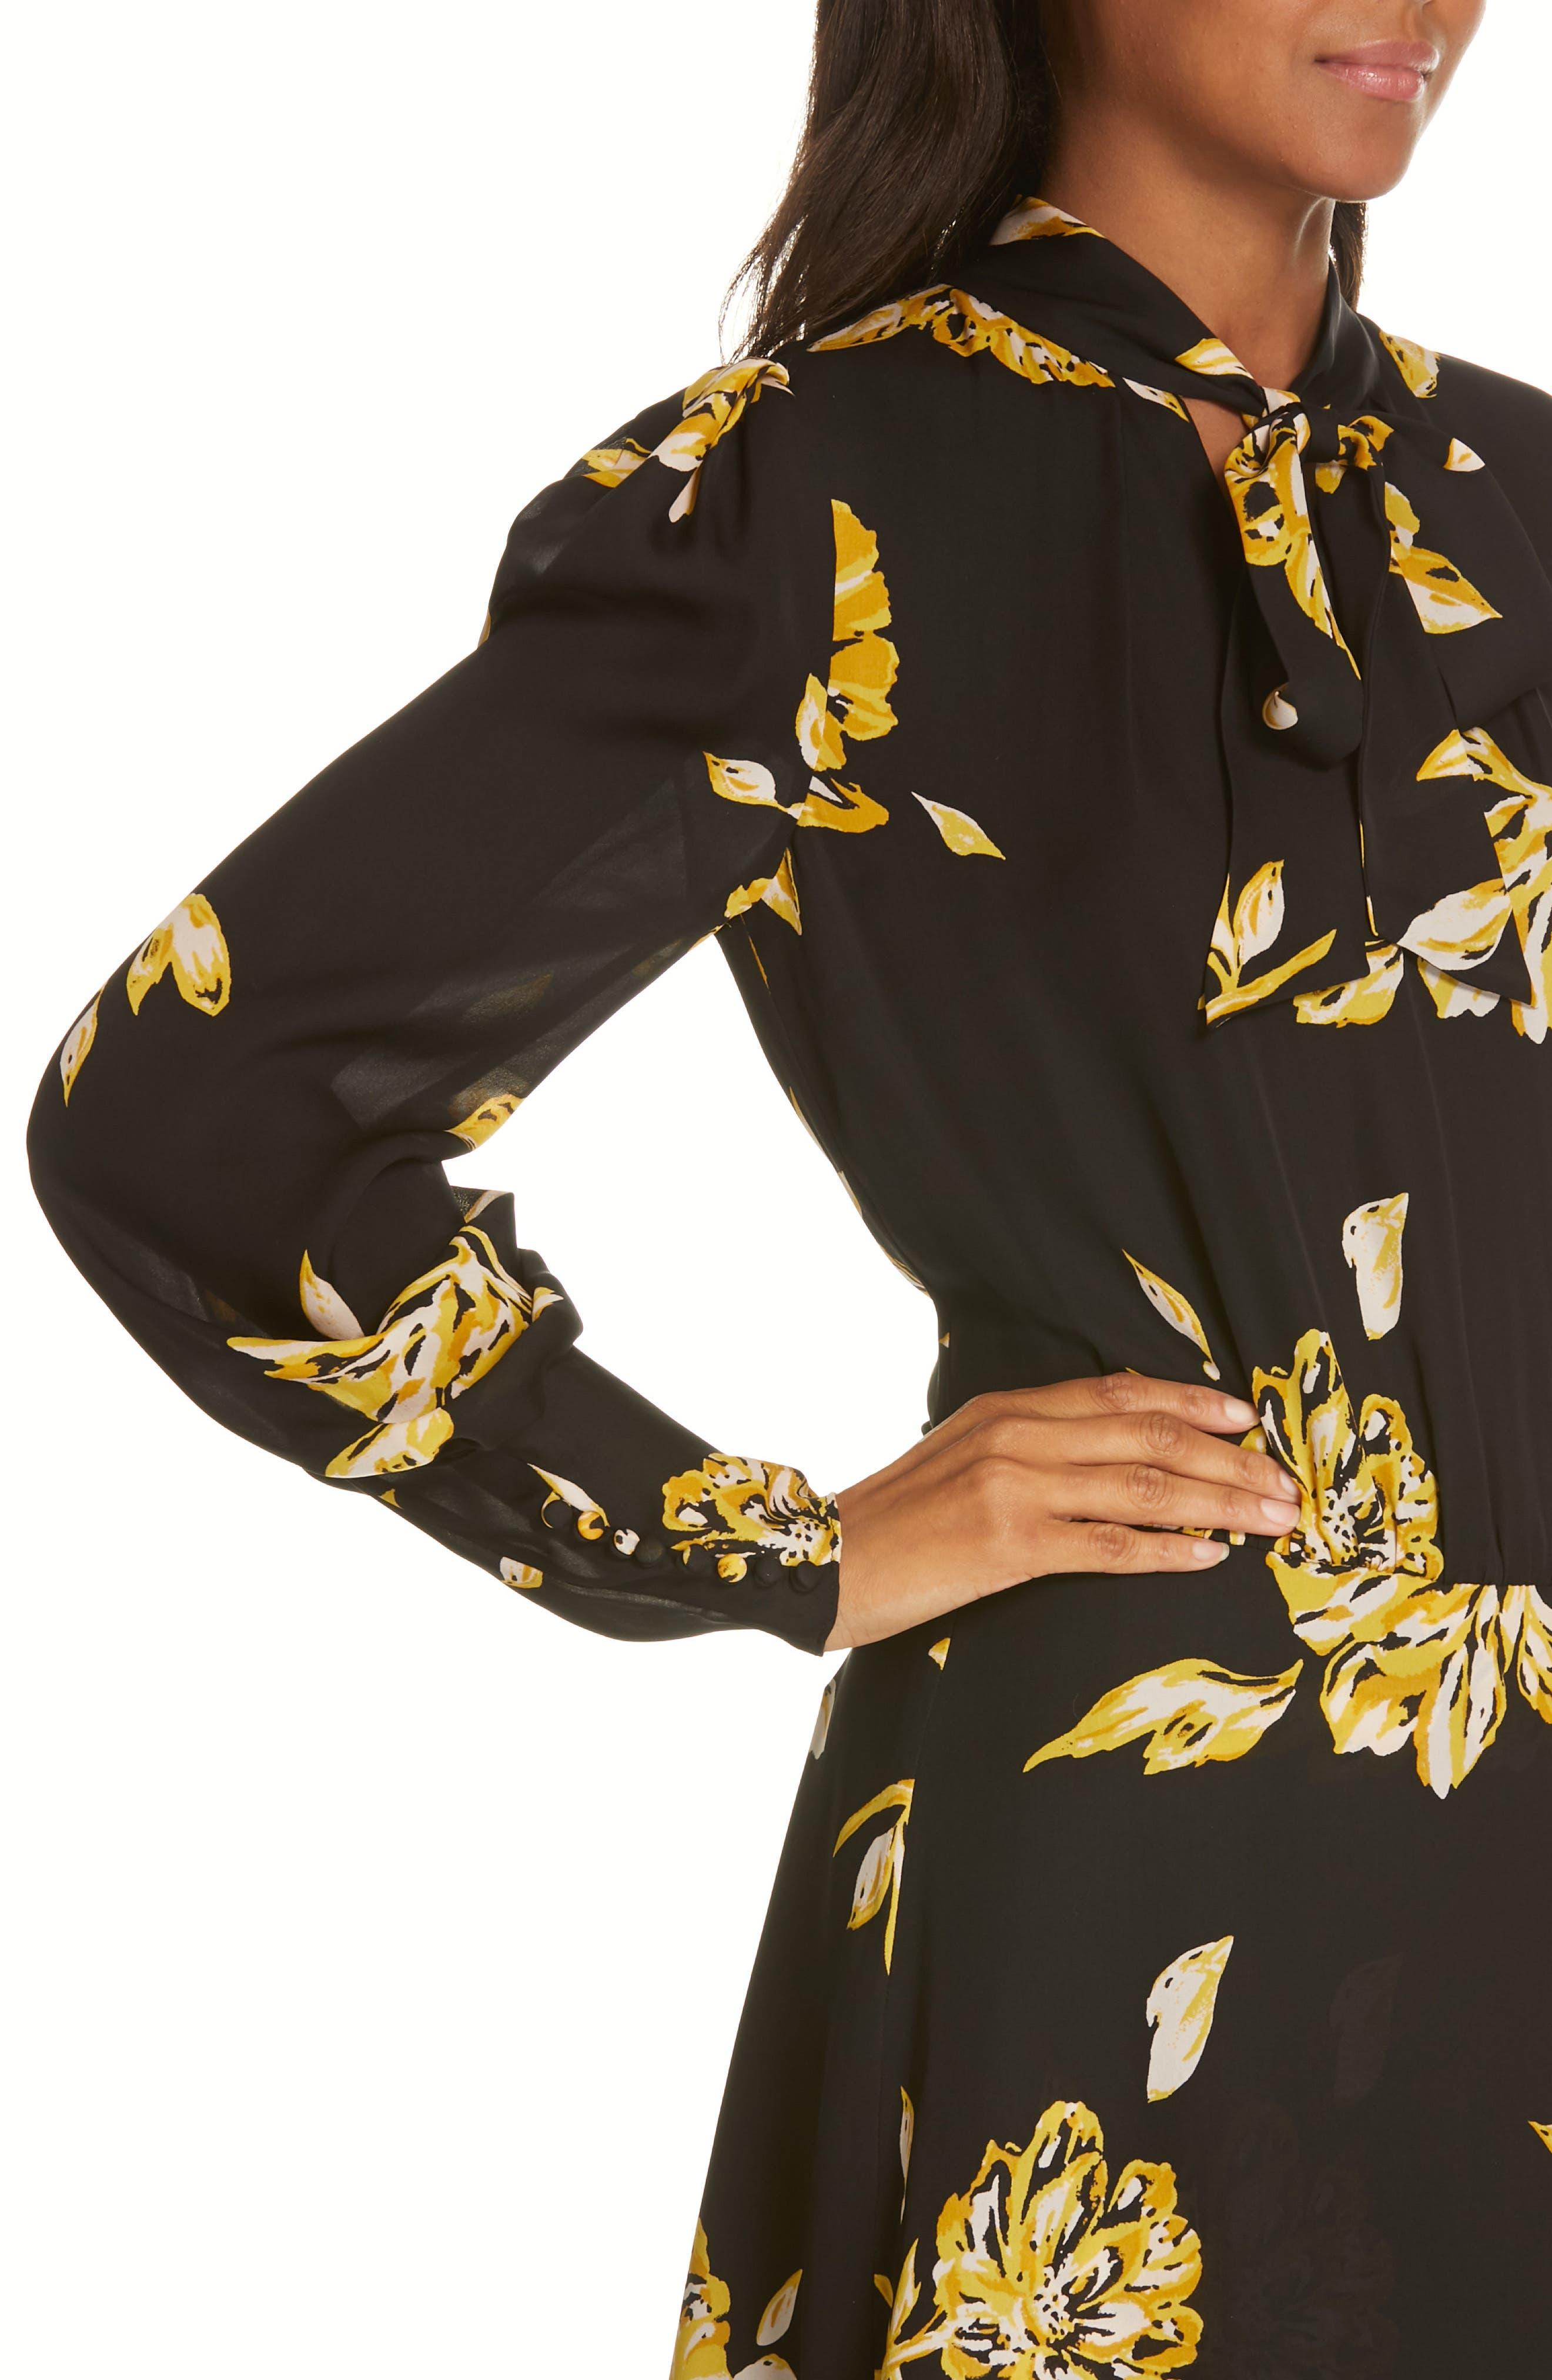 Gyan Floral Silk Dress,                             Alternate thumbnail 4, color,                             CAVIAR